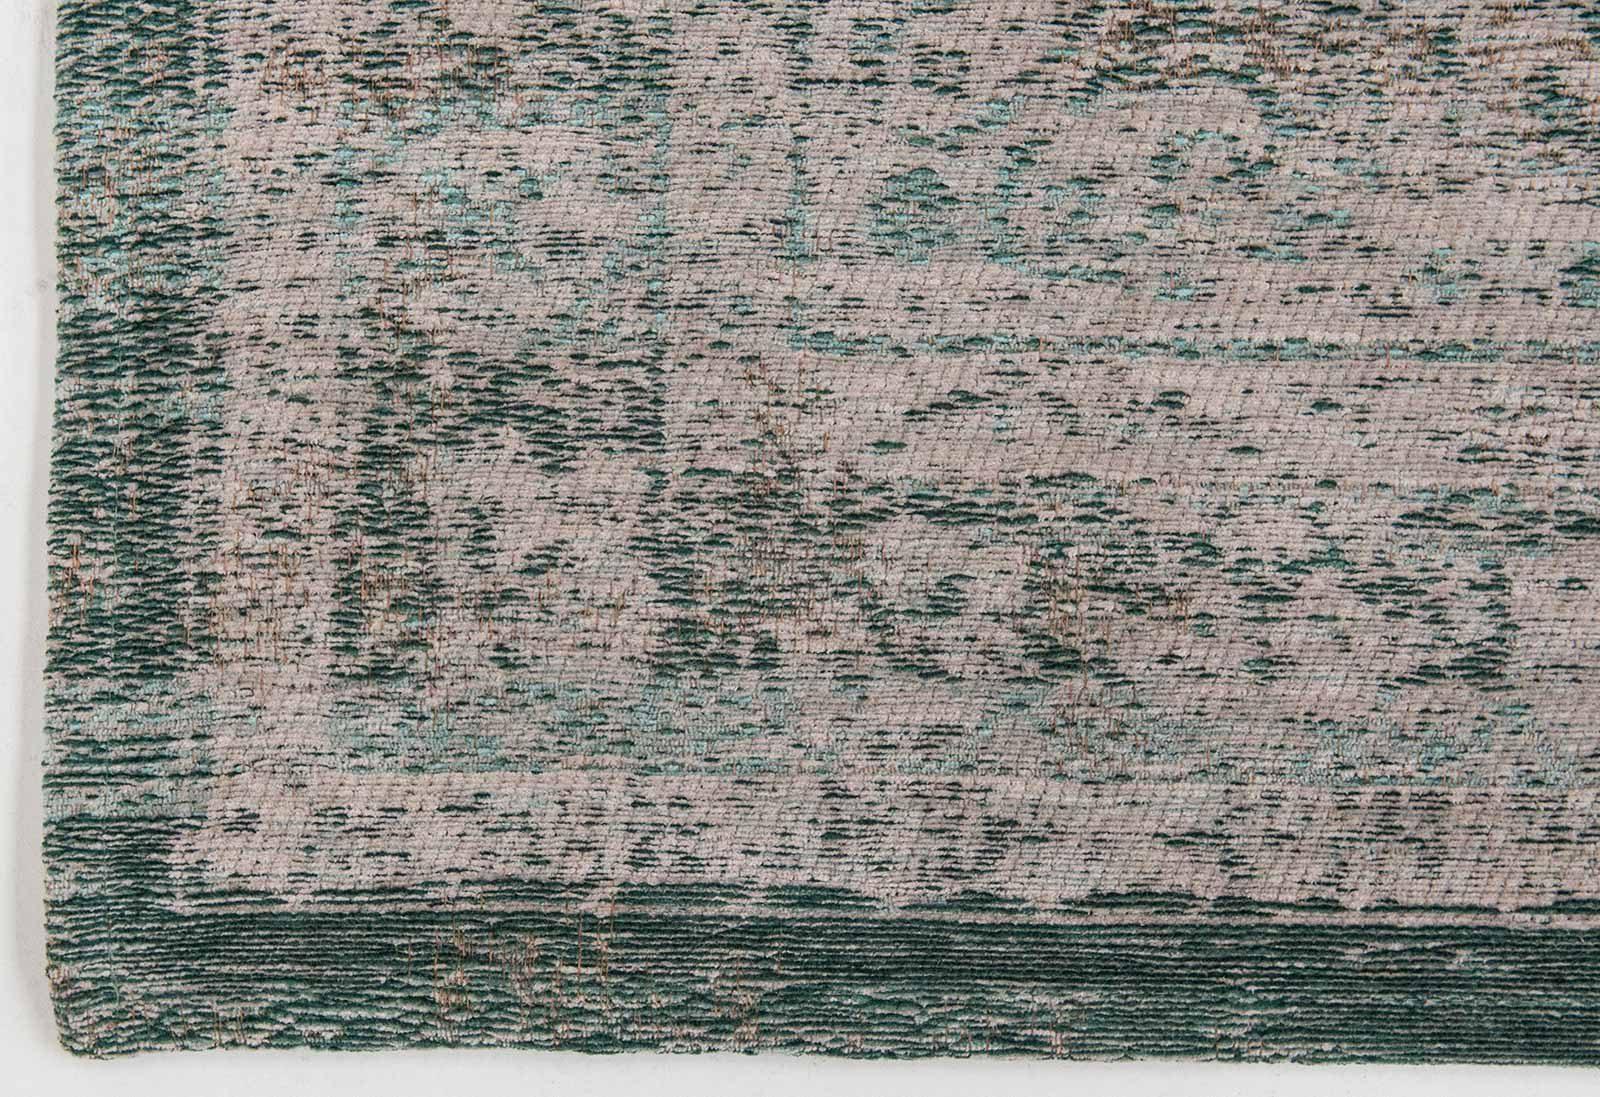 rug Louis De Poortere LX8259 Fading World Medaillon Jade Oyster corner